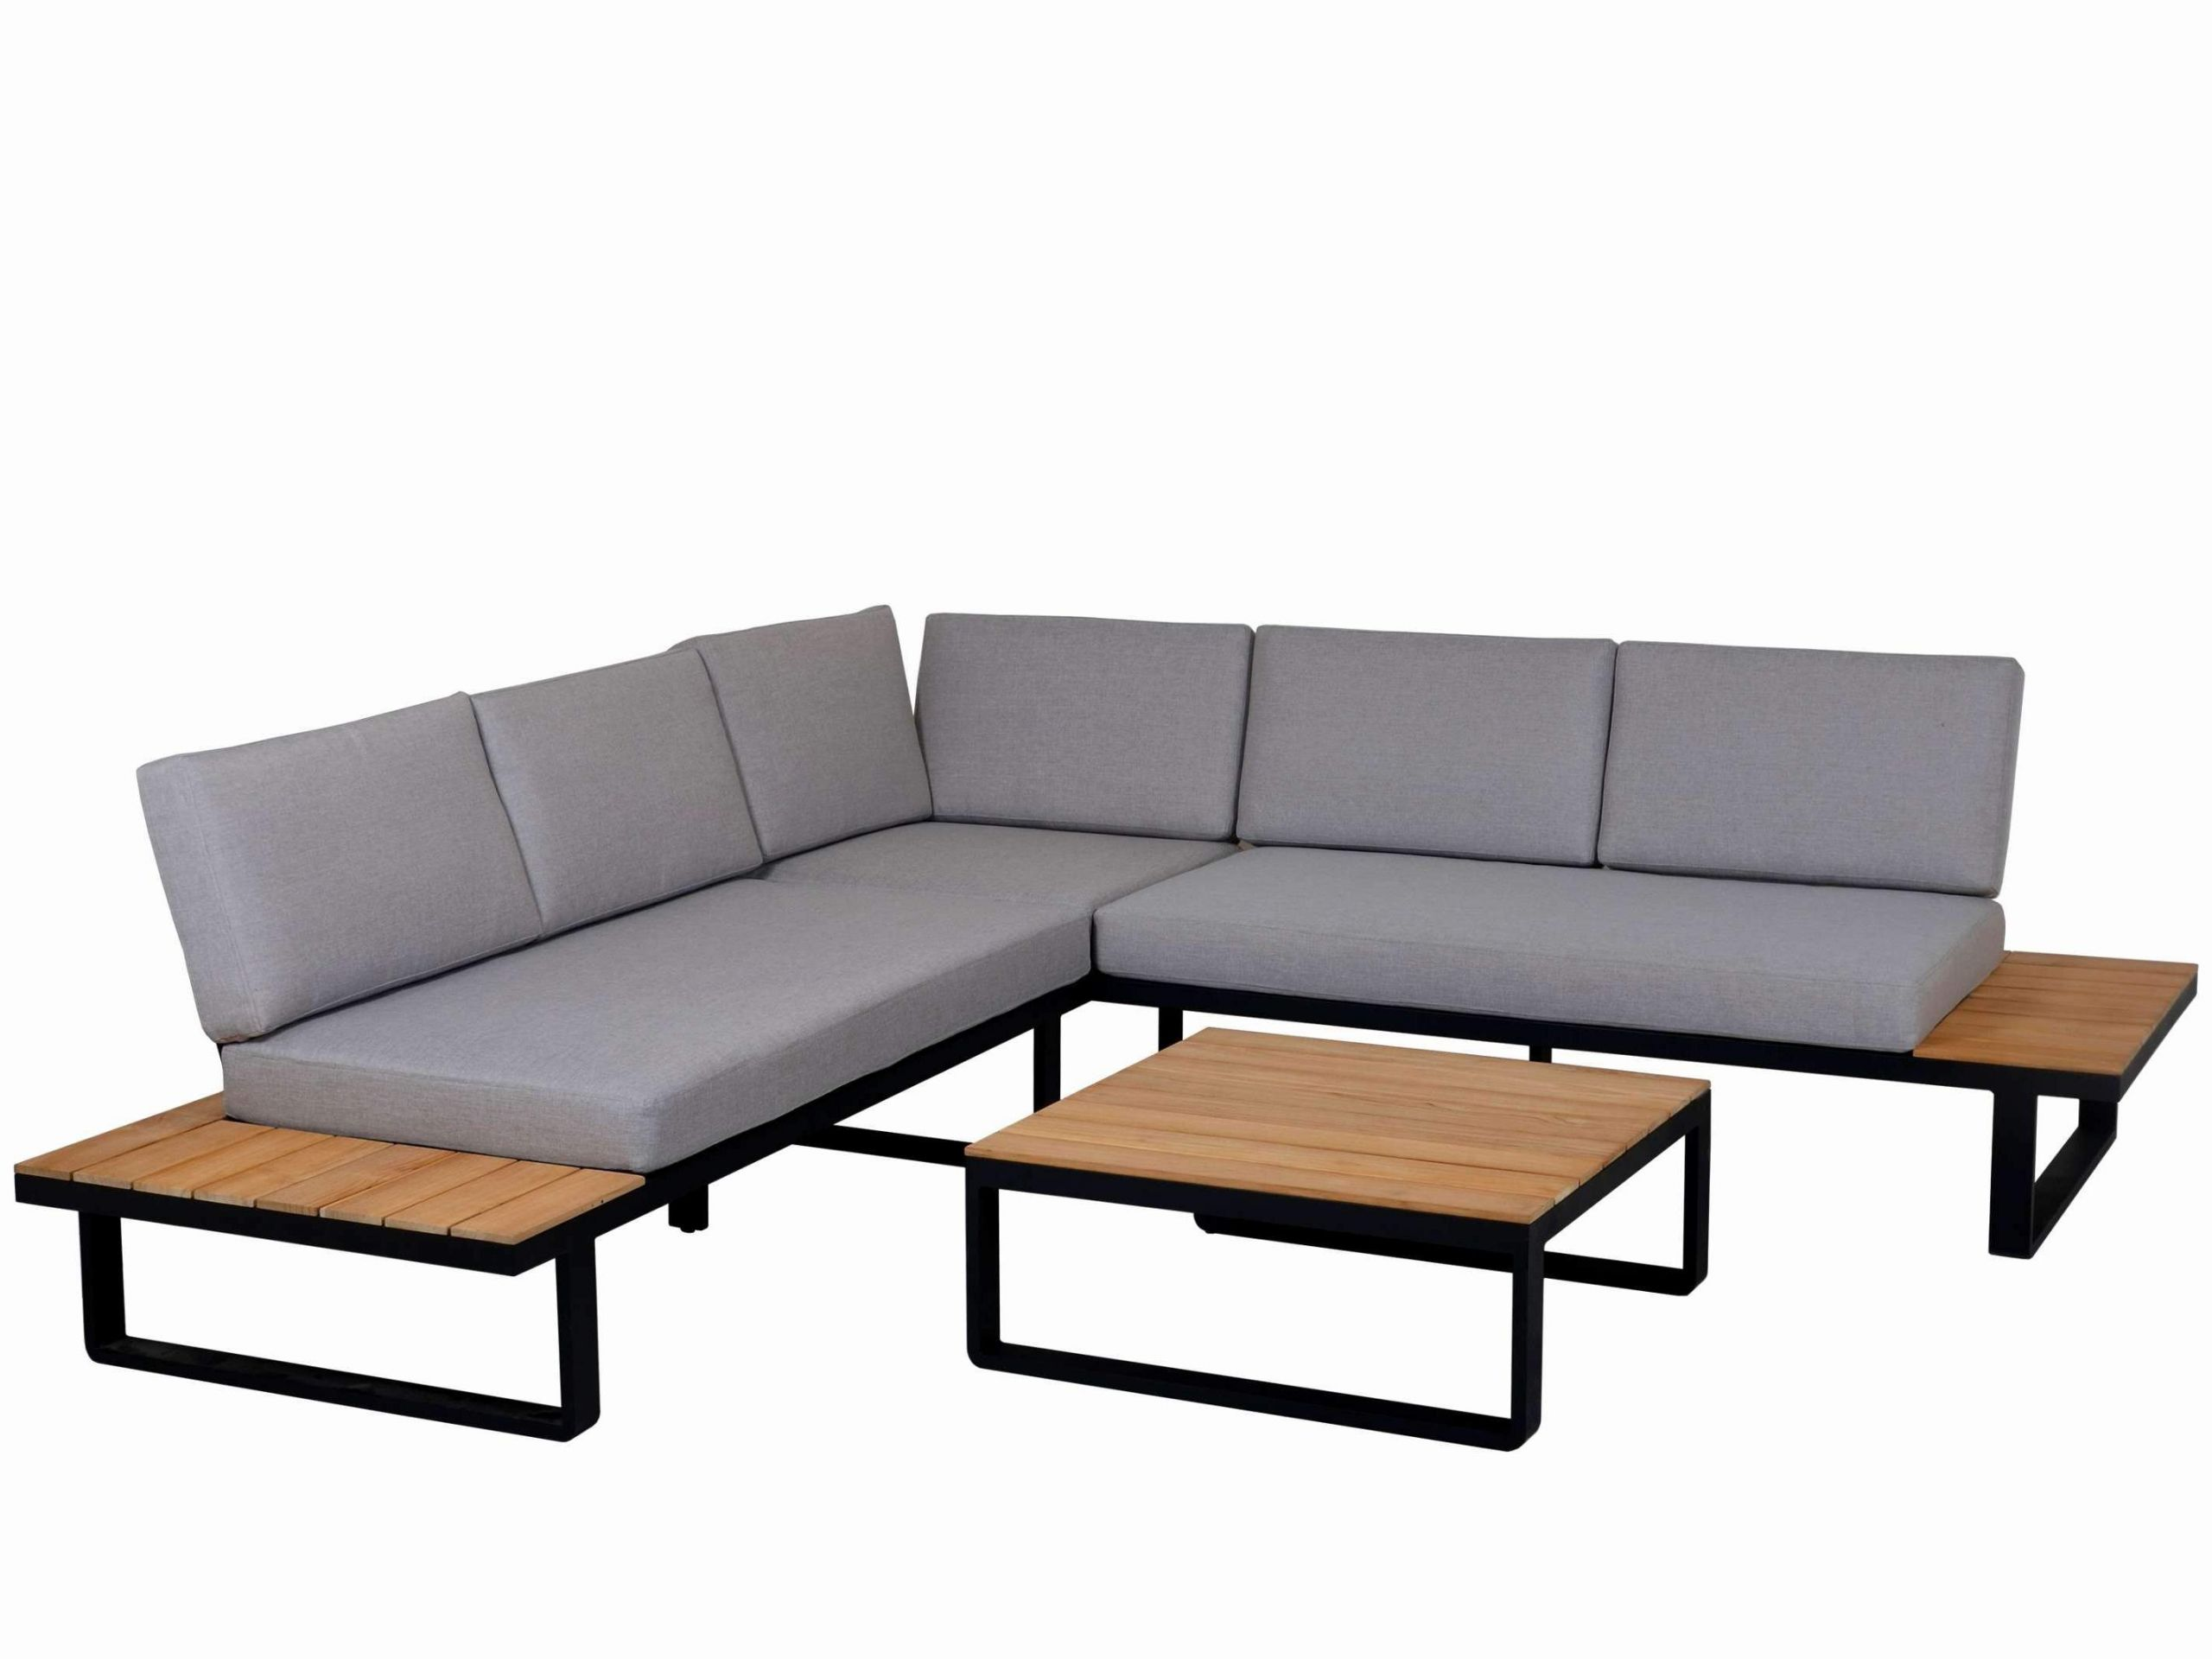 beste balkon rattan set konzept pd3kaewb of loungesessel polyrattan